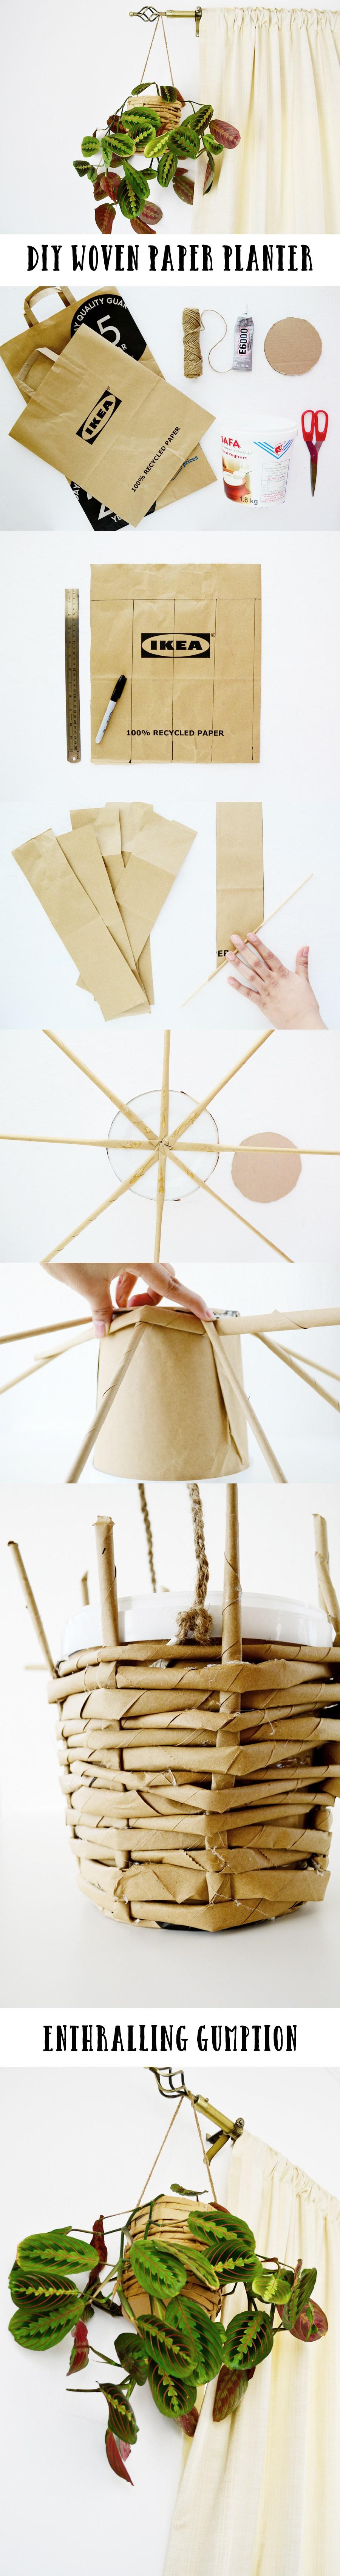 DIY Woven Paper Planter